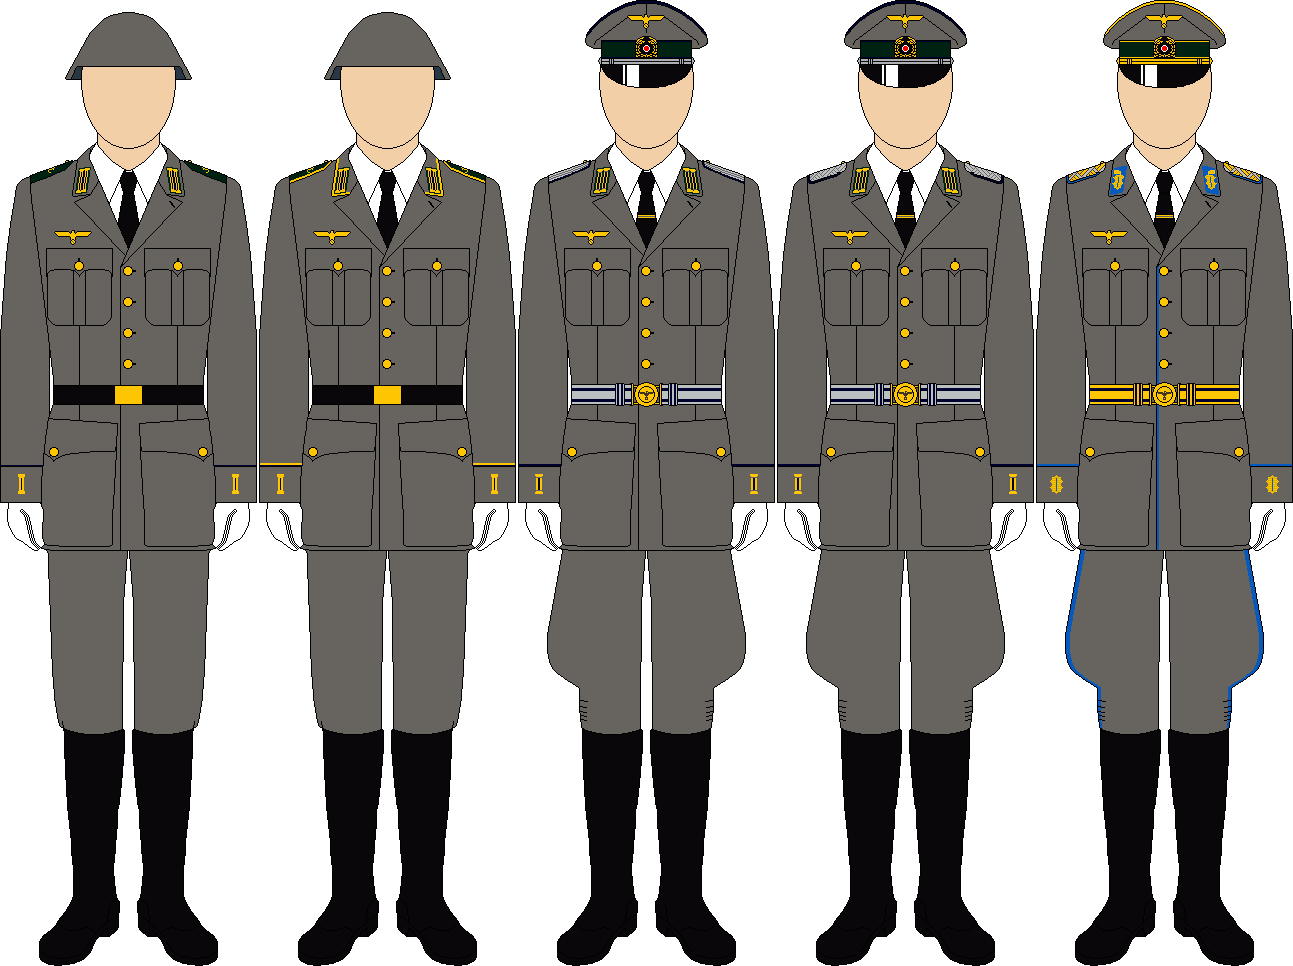 Kriegsmarine coastal service parade dress by thefalconette-d5cyckq.png